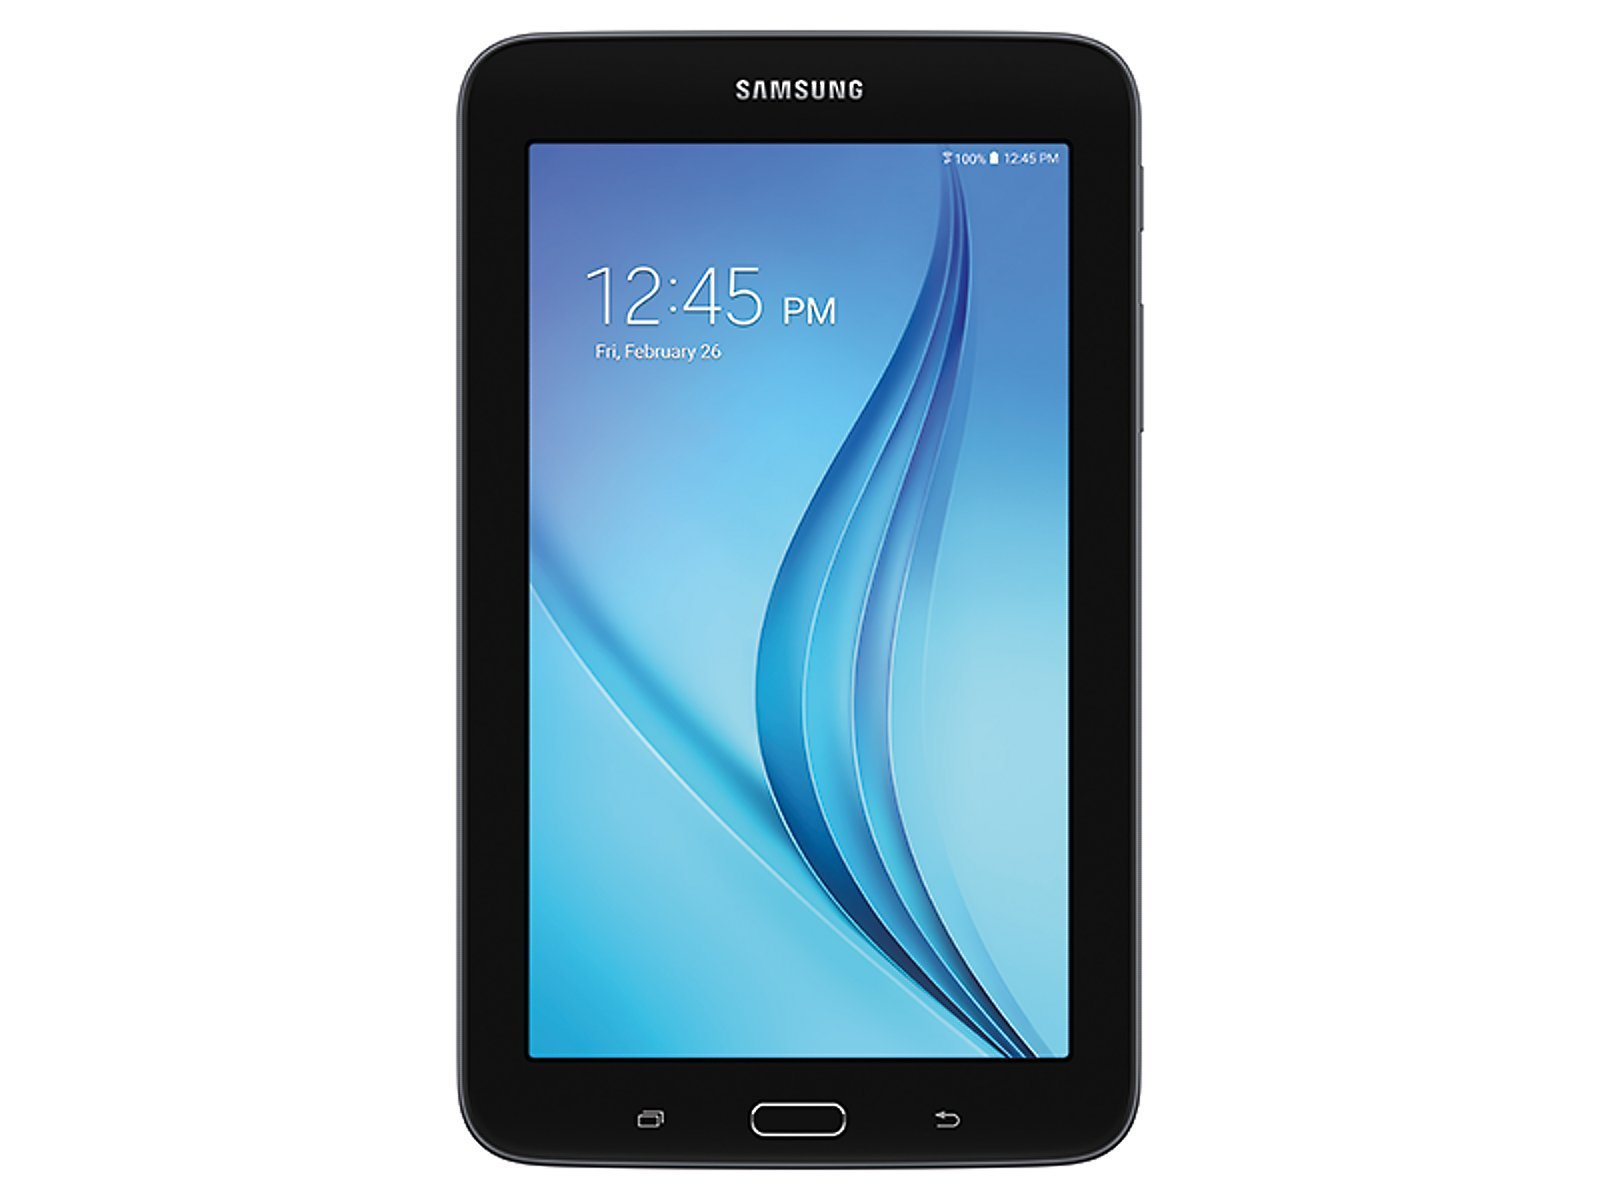 Samsung Galaxy Tab E Lite 7.0'' 8GB (Black) (Certified Refurbished)